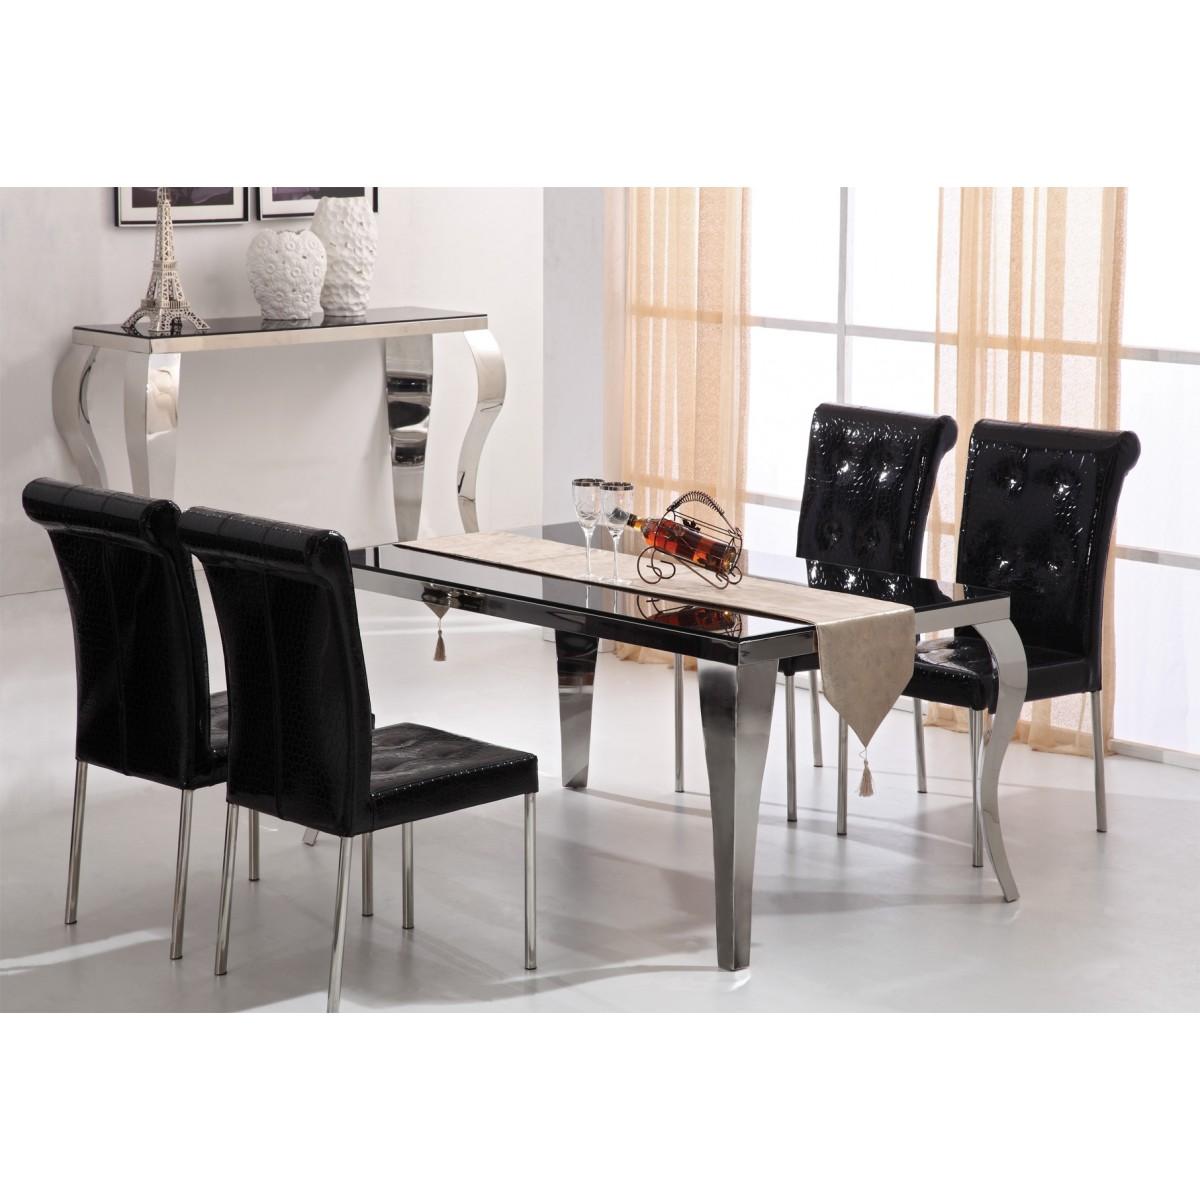 Table de salle manger barone for Destockage table a manger